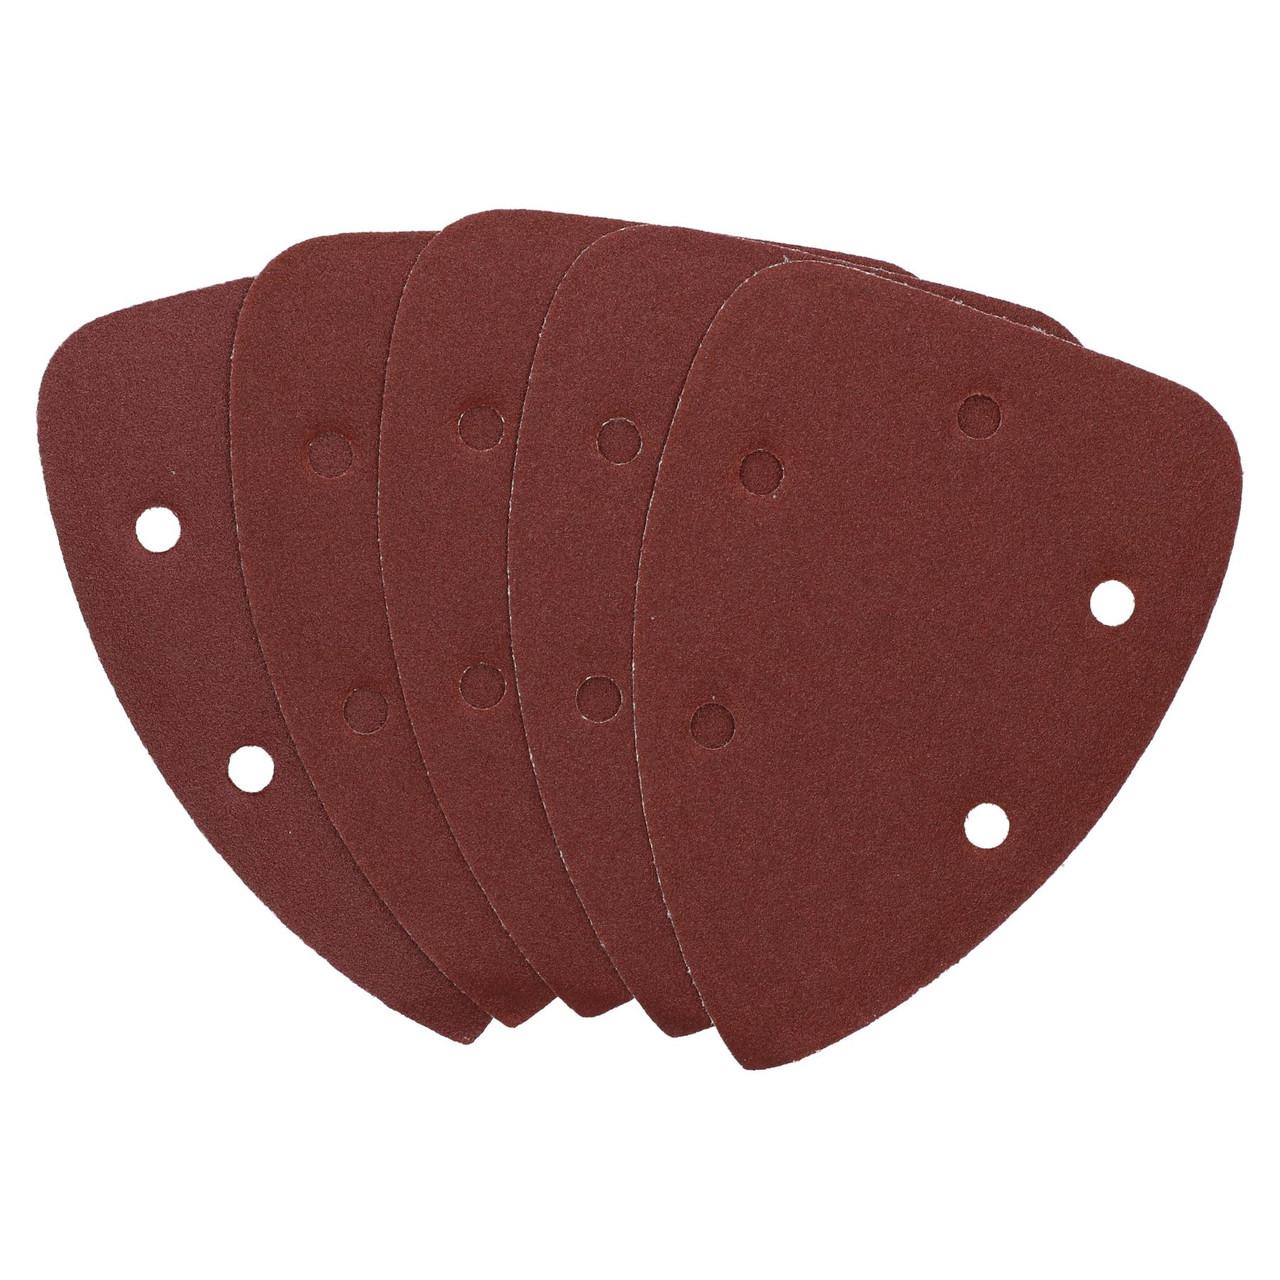 Hook And Loop Detail Sanding Pads Discs 140mm Triangular 80 Grit Medium 100pc